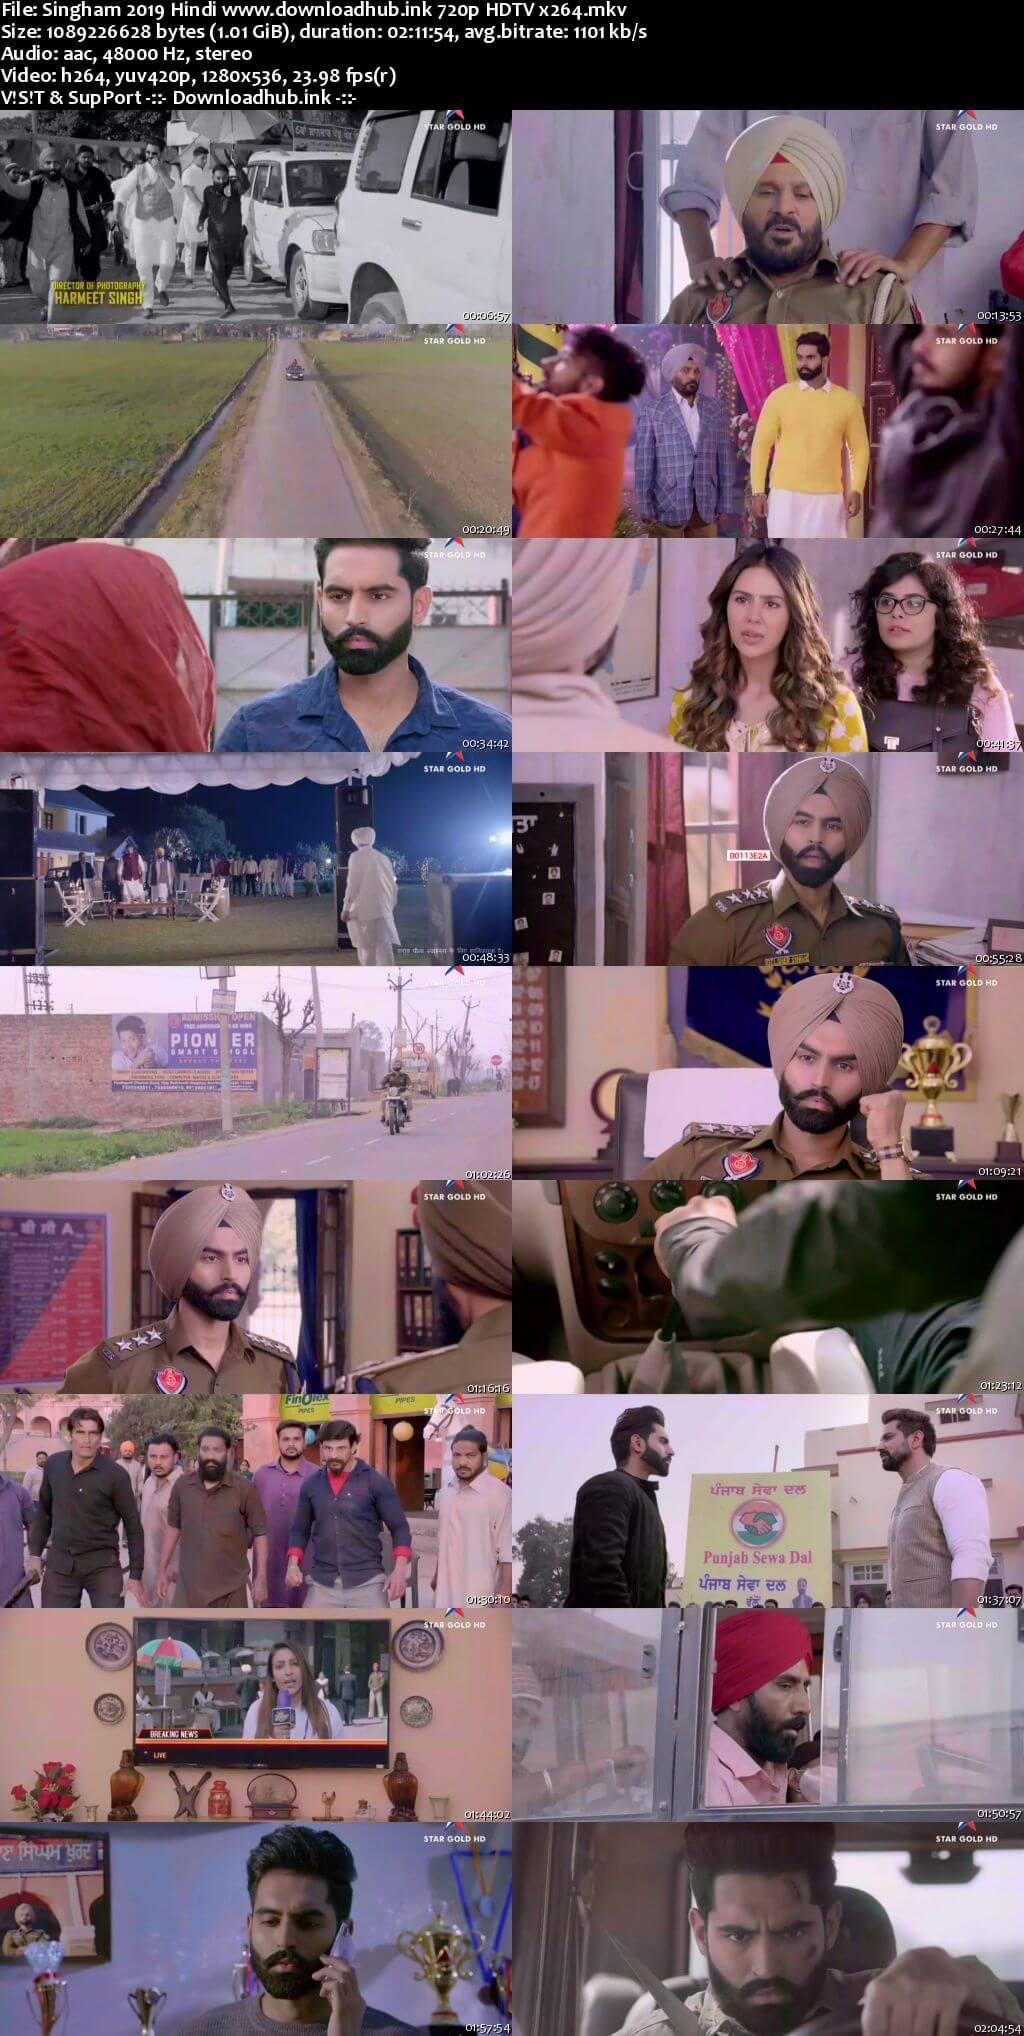 Singham 2019 Hindi 720p HDTV x264